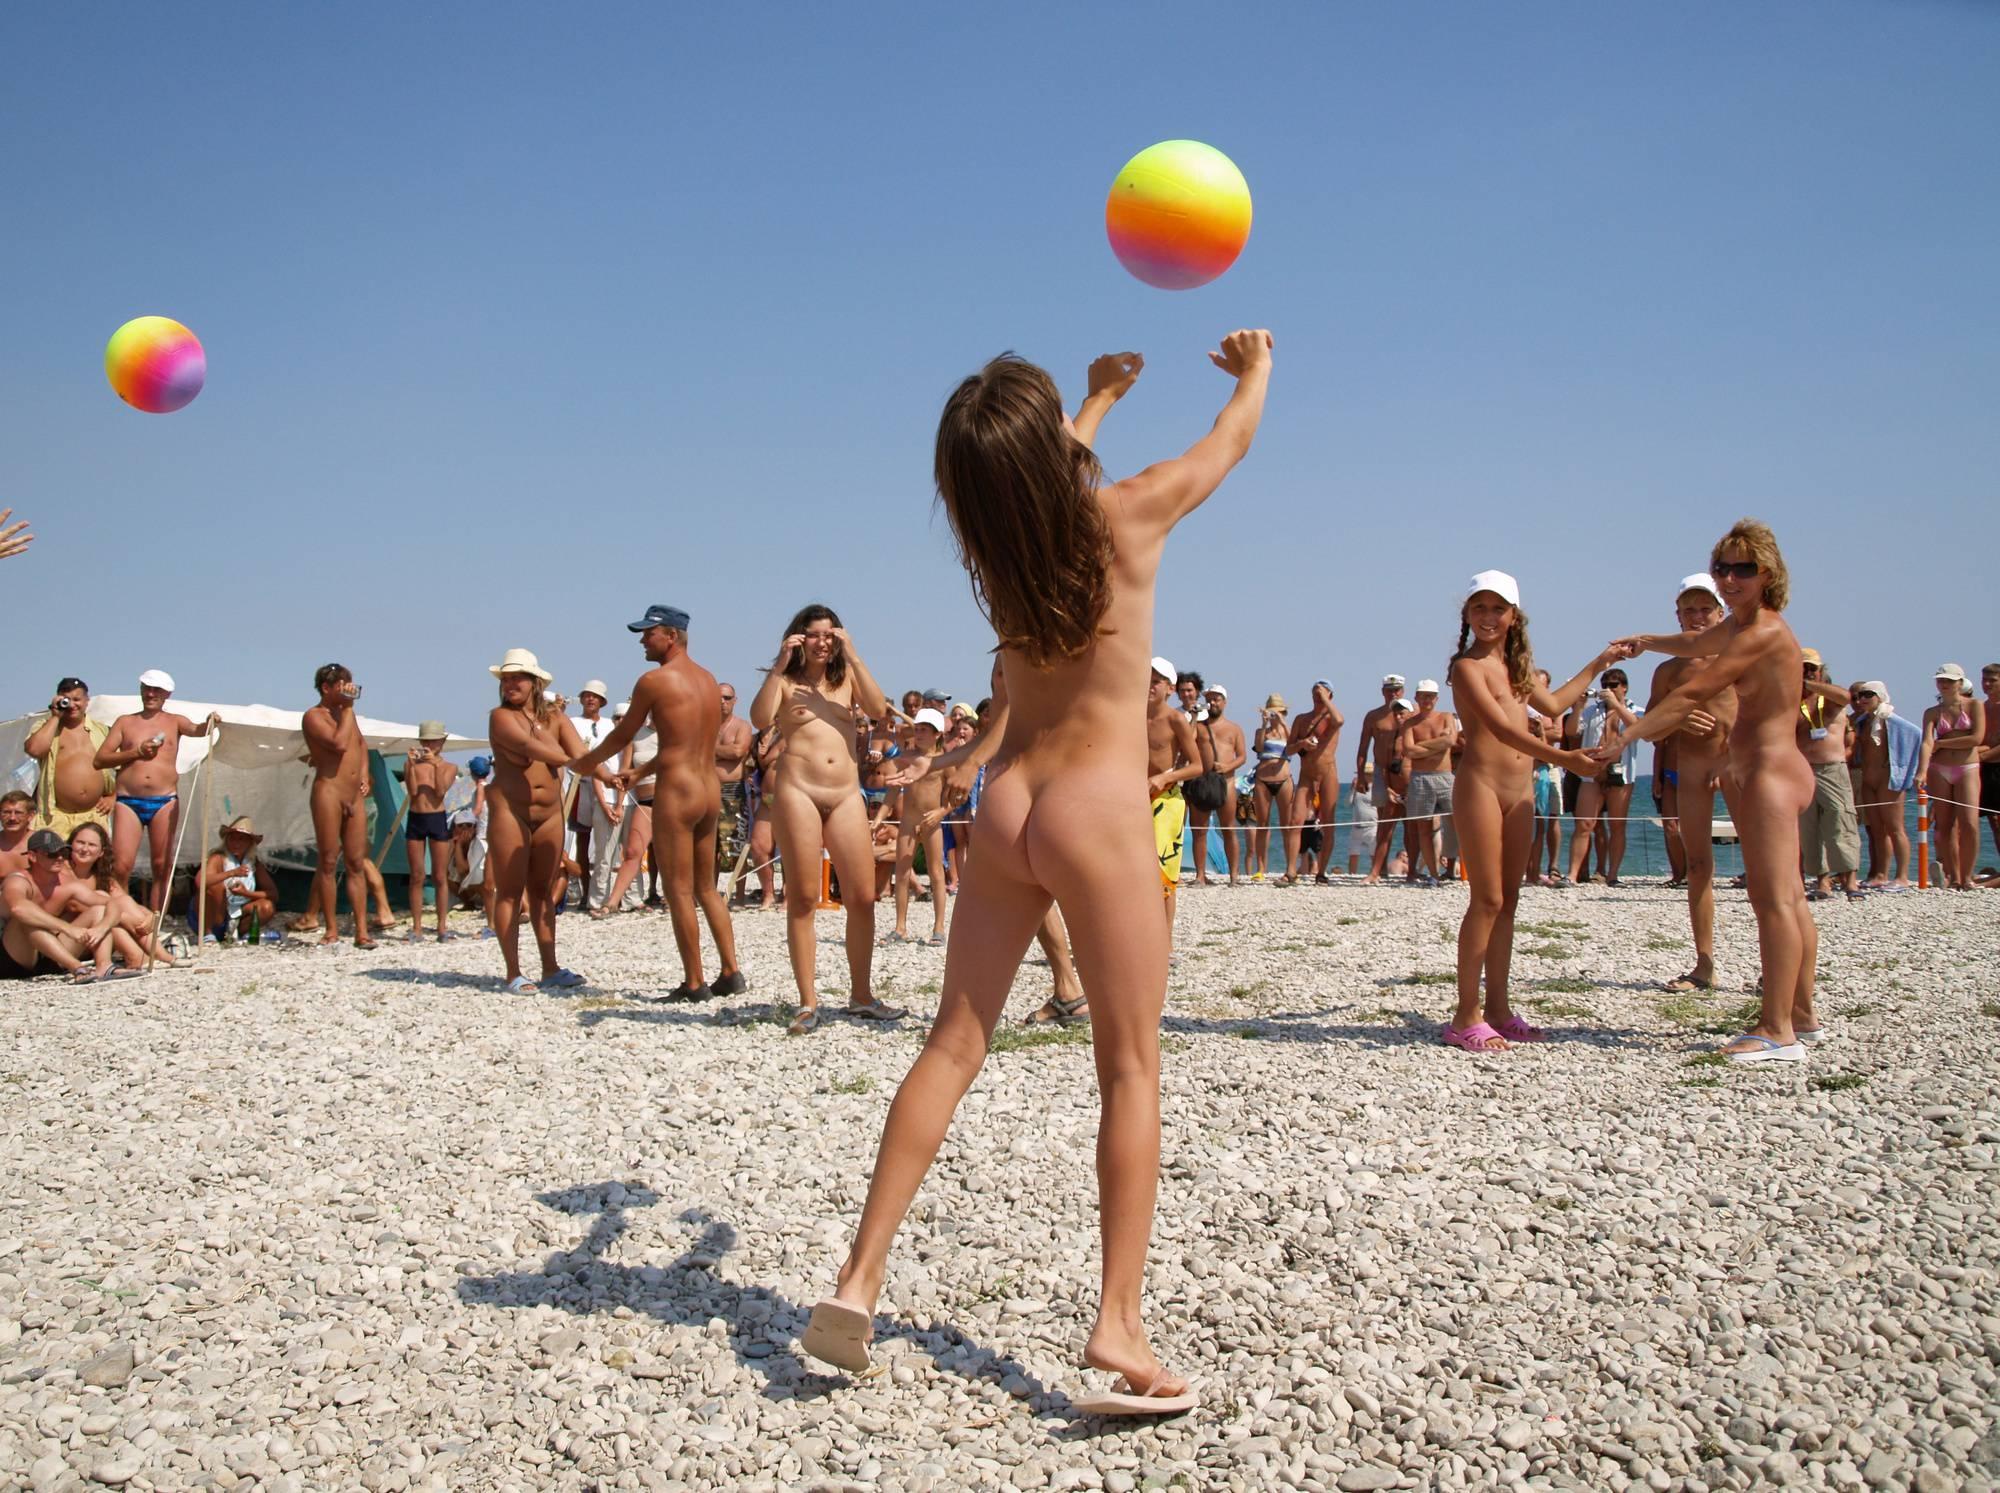 Nudist Beach Kid's Ball - 2